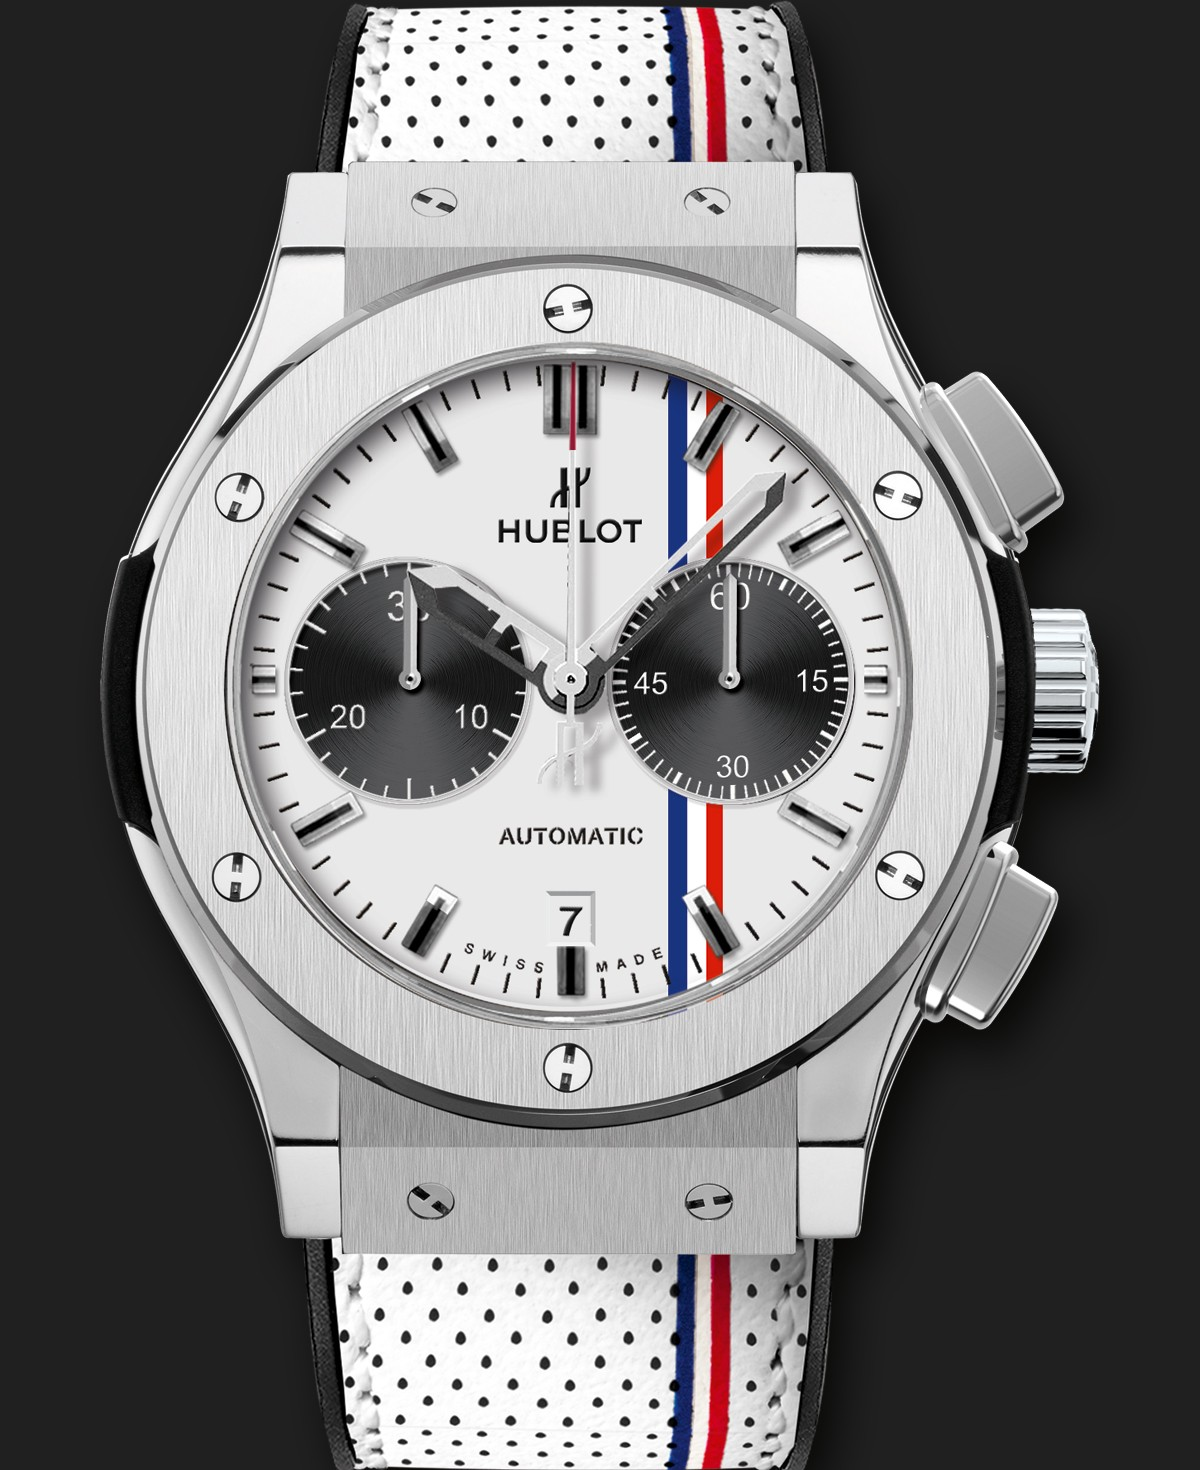 3c1b0157c4e Relógio Réplica Hublot Fusion Edition Limited